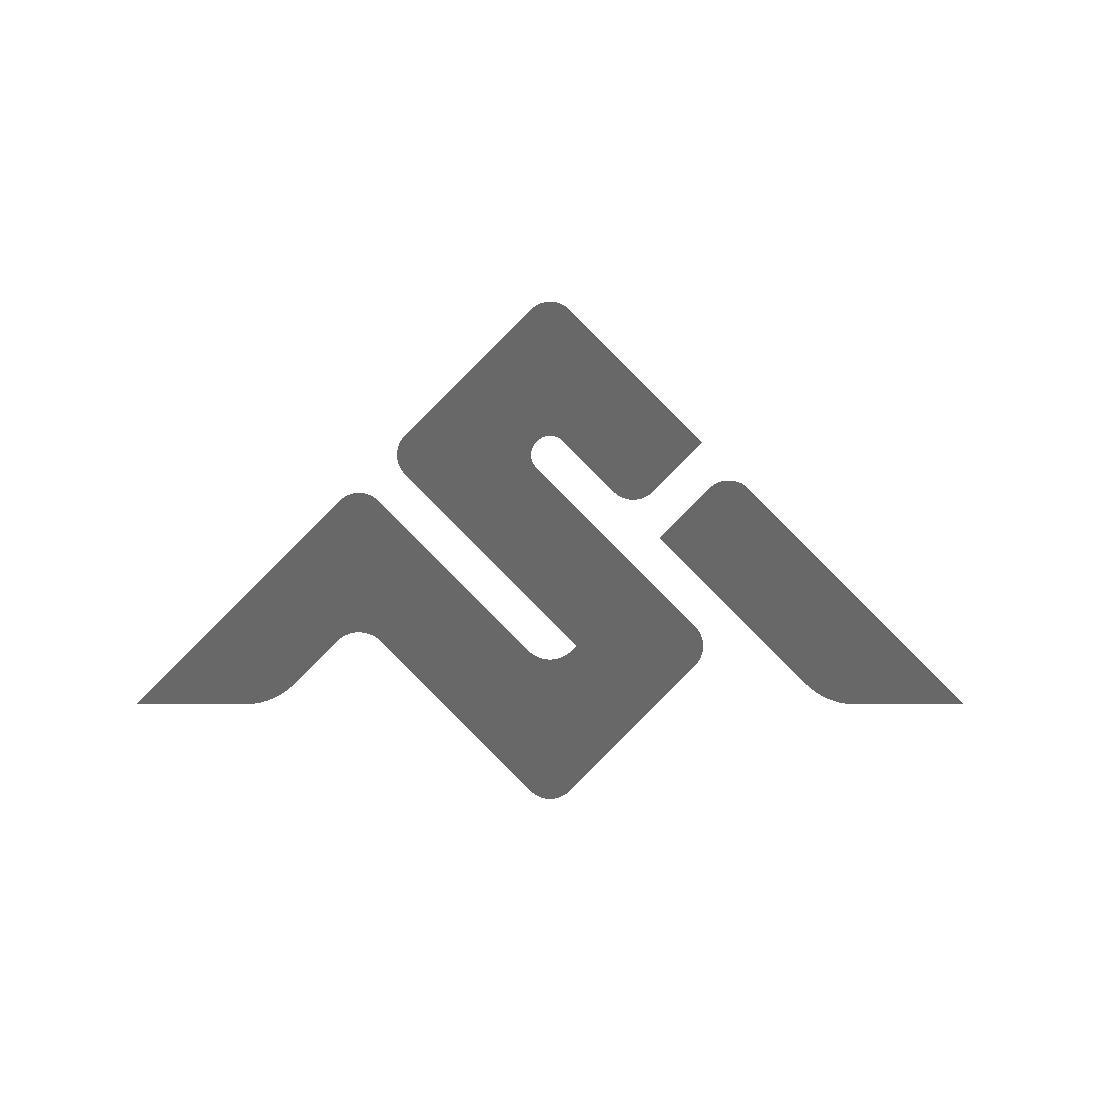 aef6ff0a55 Rossignol Giant ski suit (adult) - Sportmania